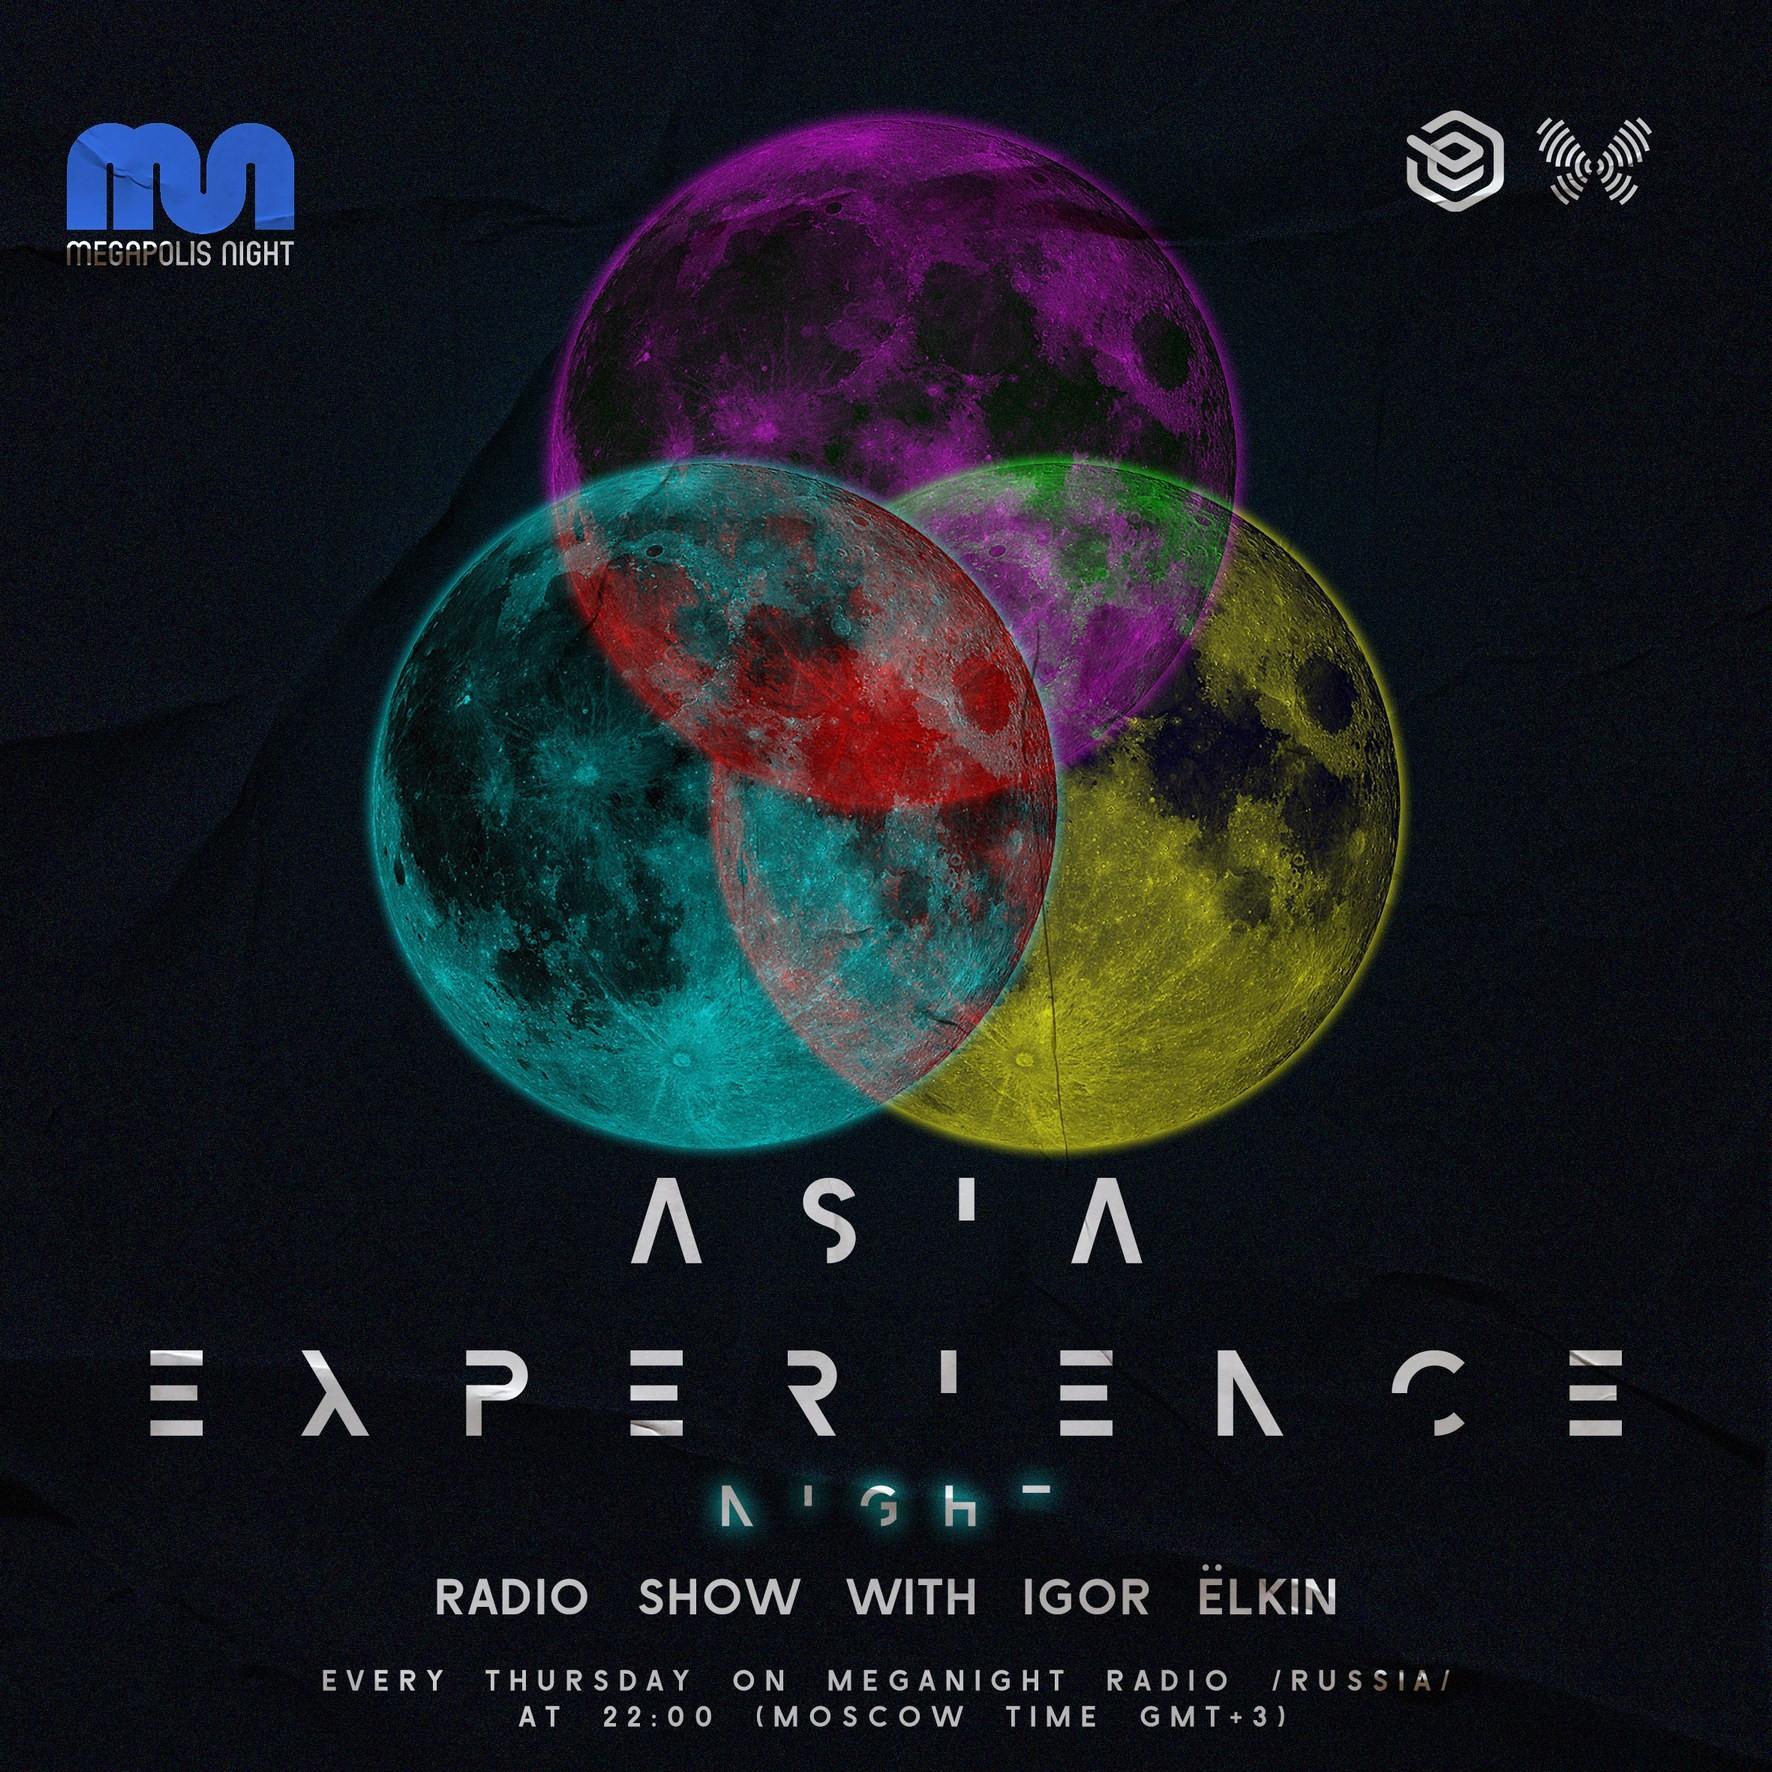 Elkin - Asia Experience Night  Radio Show #048 @ Megapolis Night  29.04.2021 #48